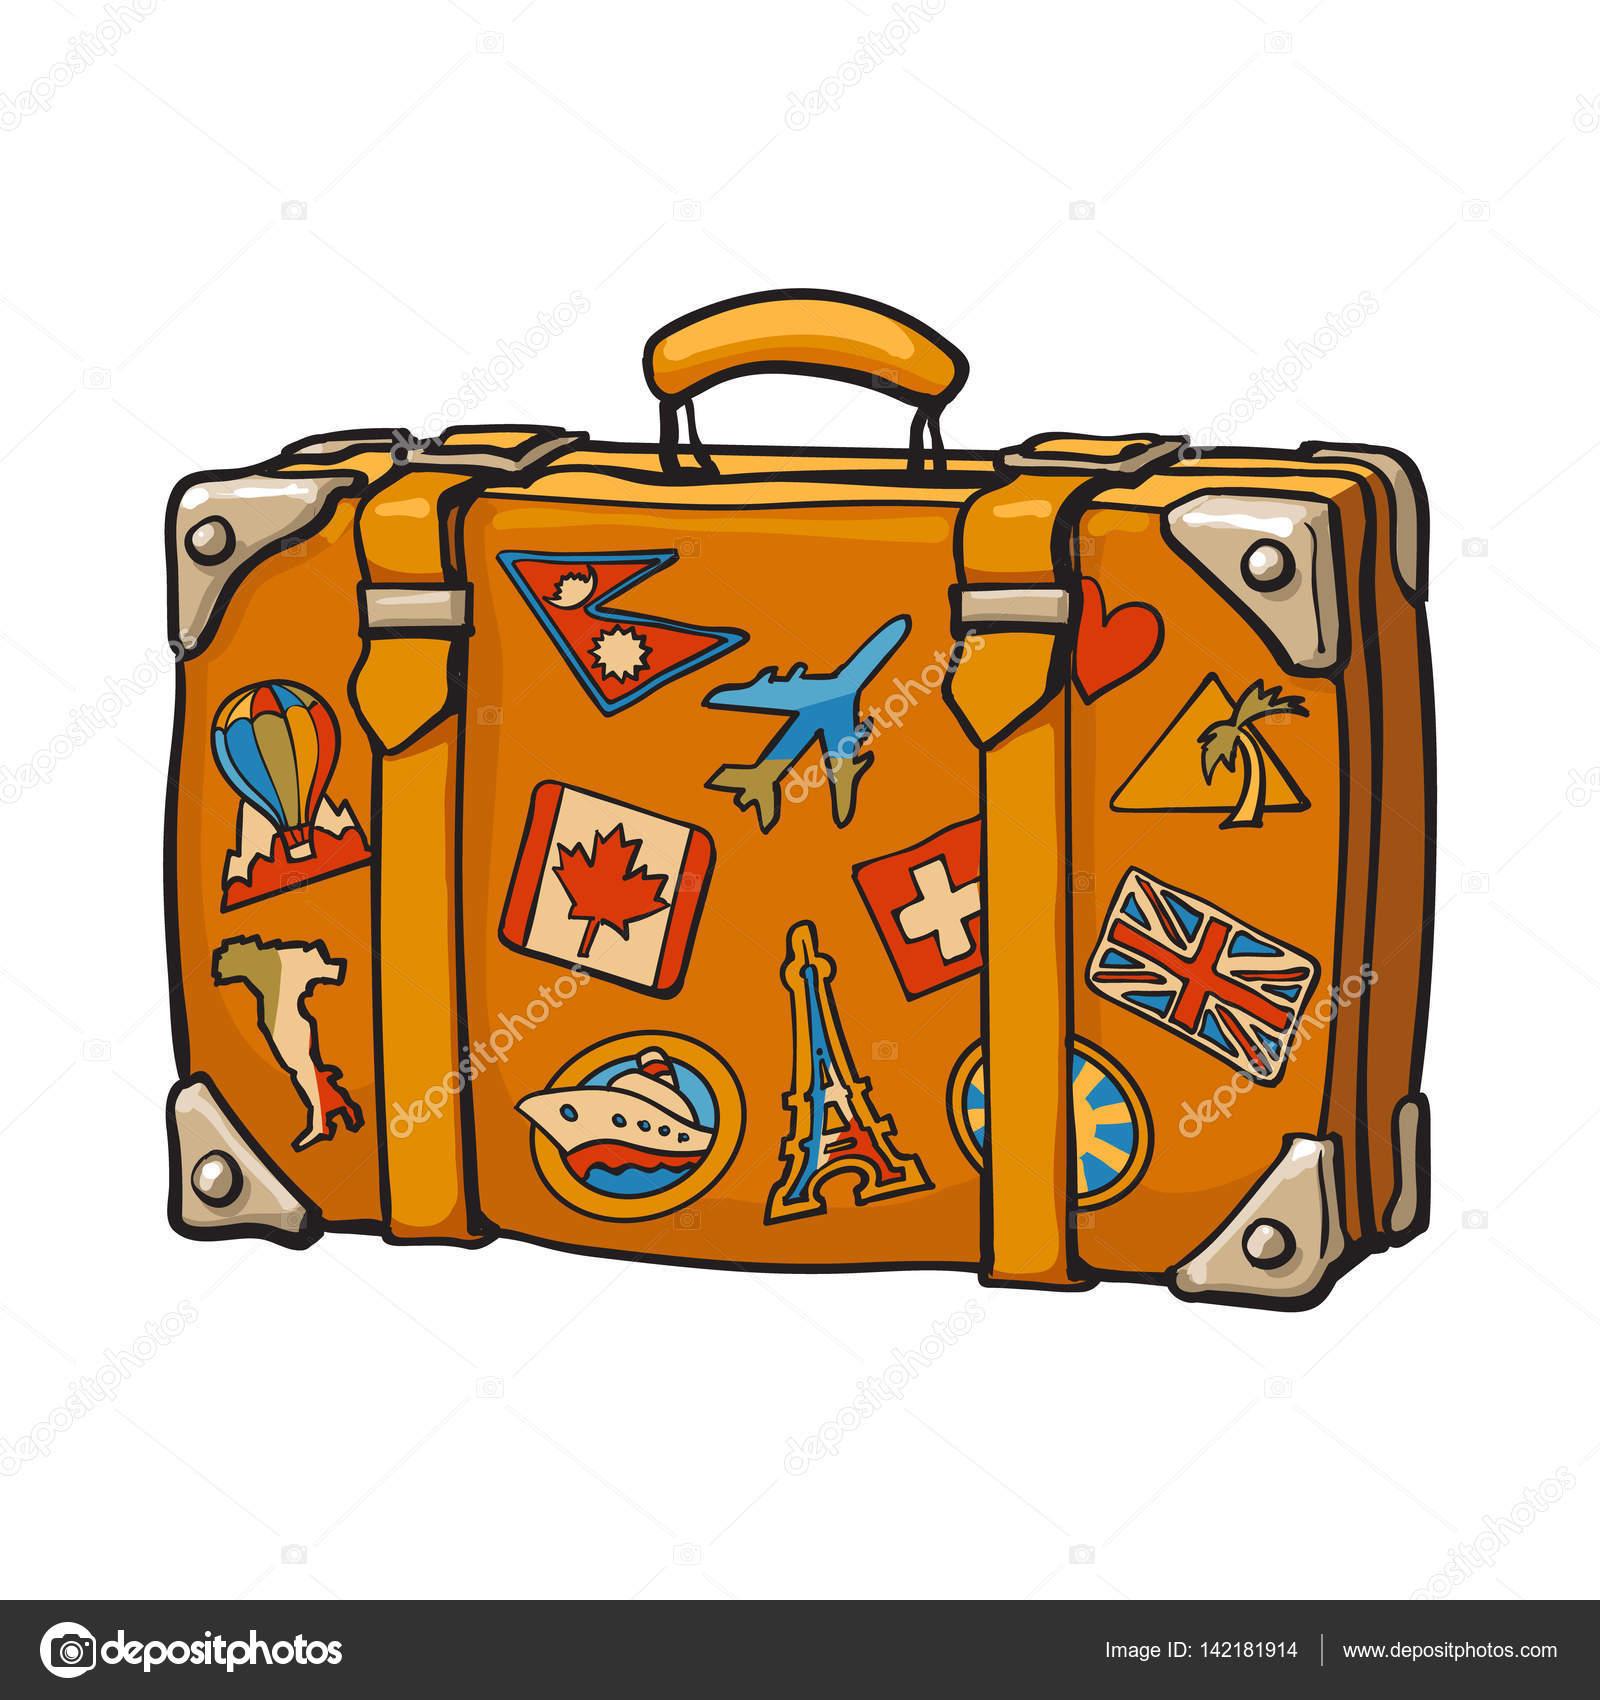 hand getekende retro stijl reizen koffer met kleurrijke etiketten stockvector sabelskaya. Black Bedroom Furniture Sets. Home Design Ideas